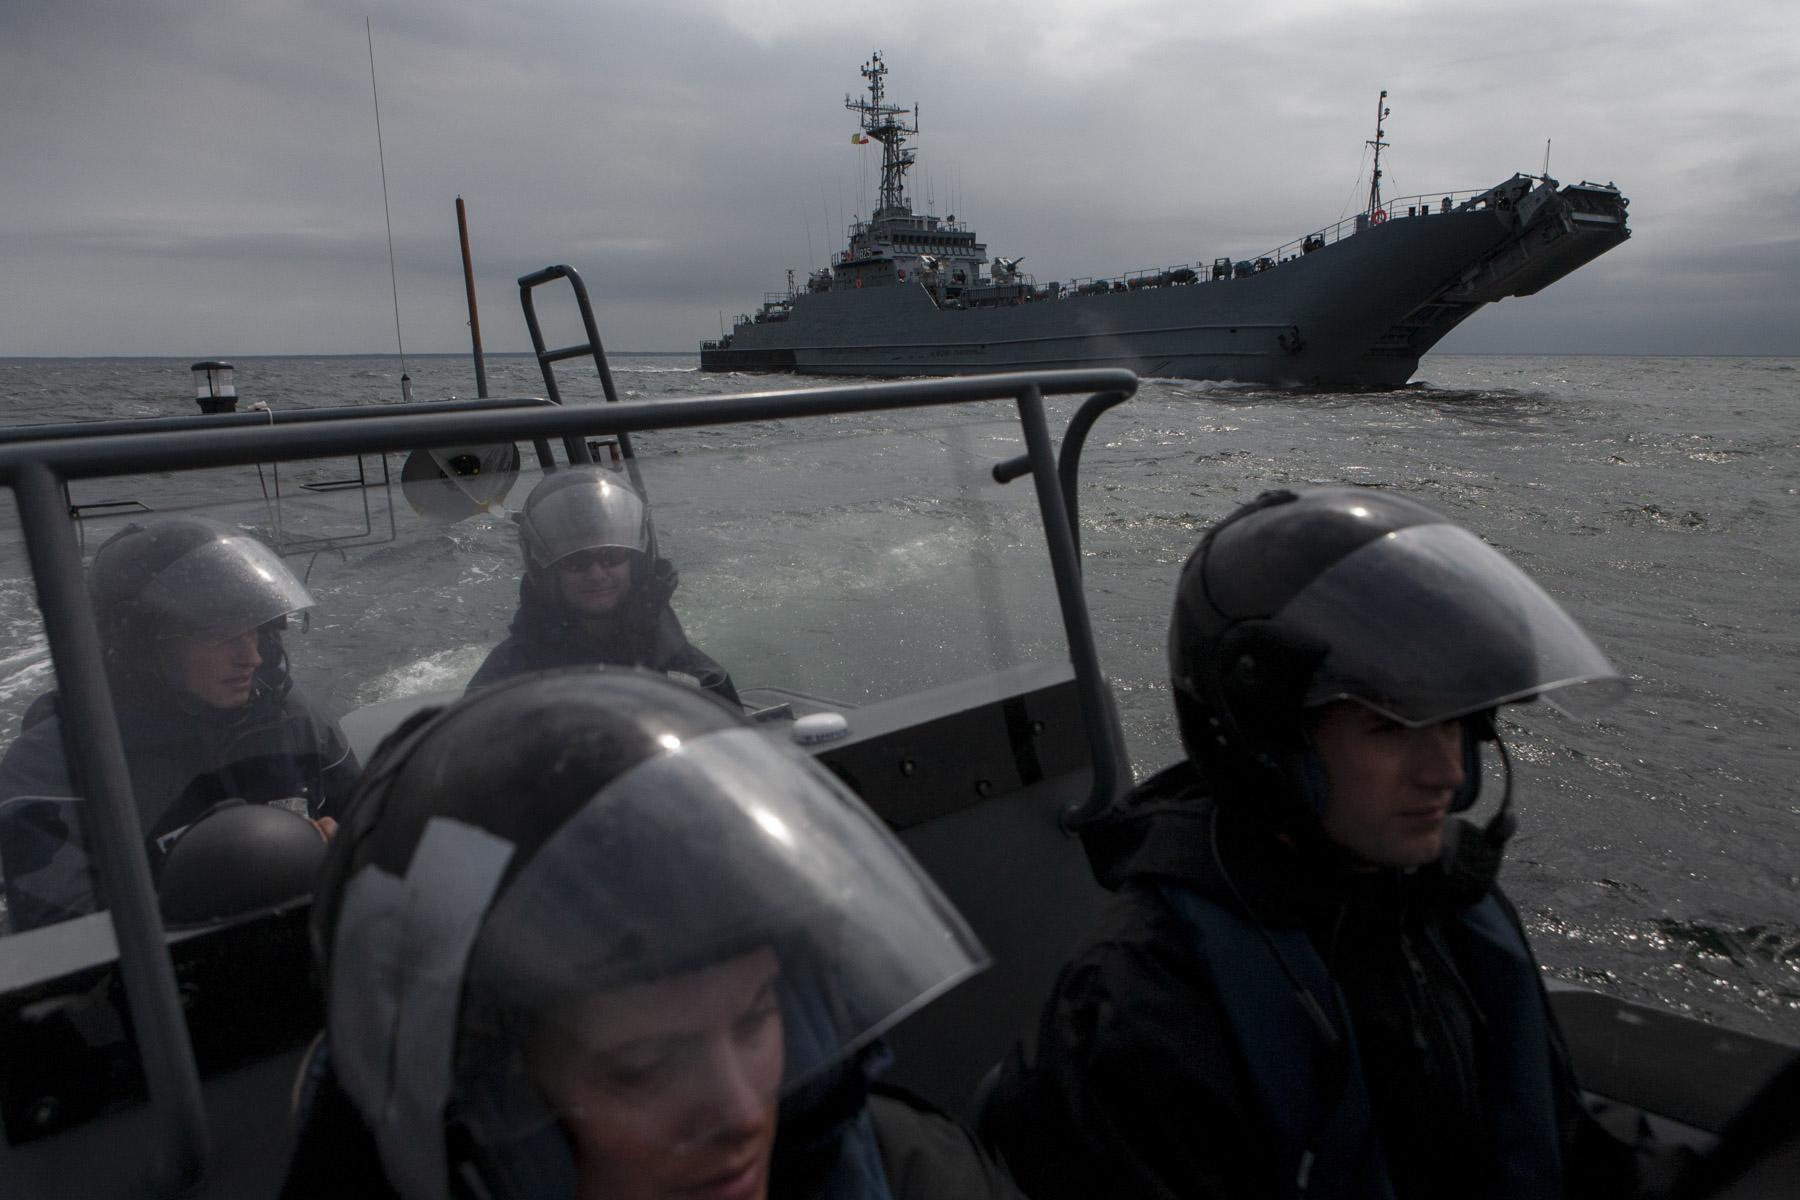 Polish Navy warship ORP Toruń. War games on the Baltic Sea.